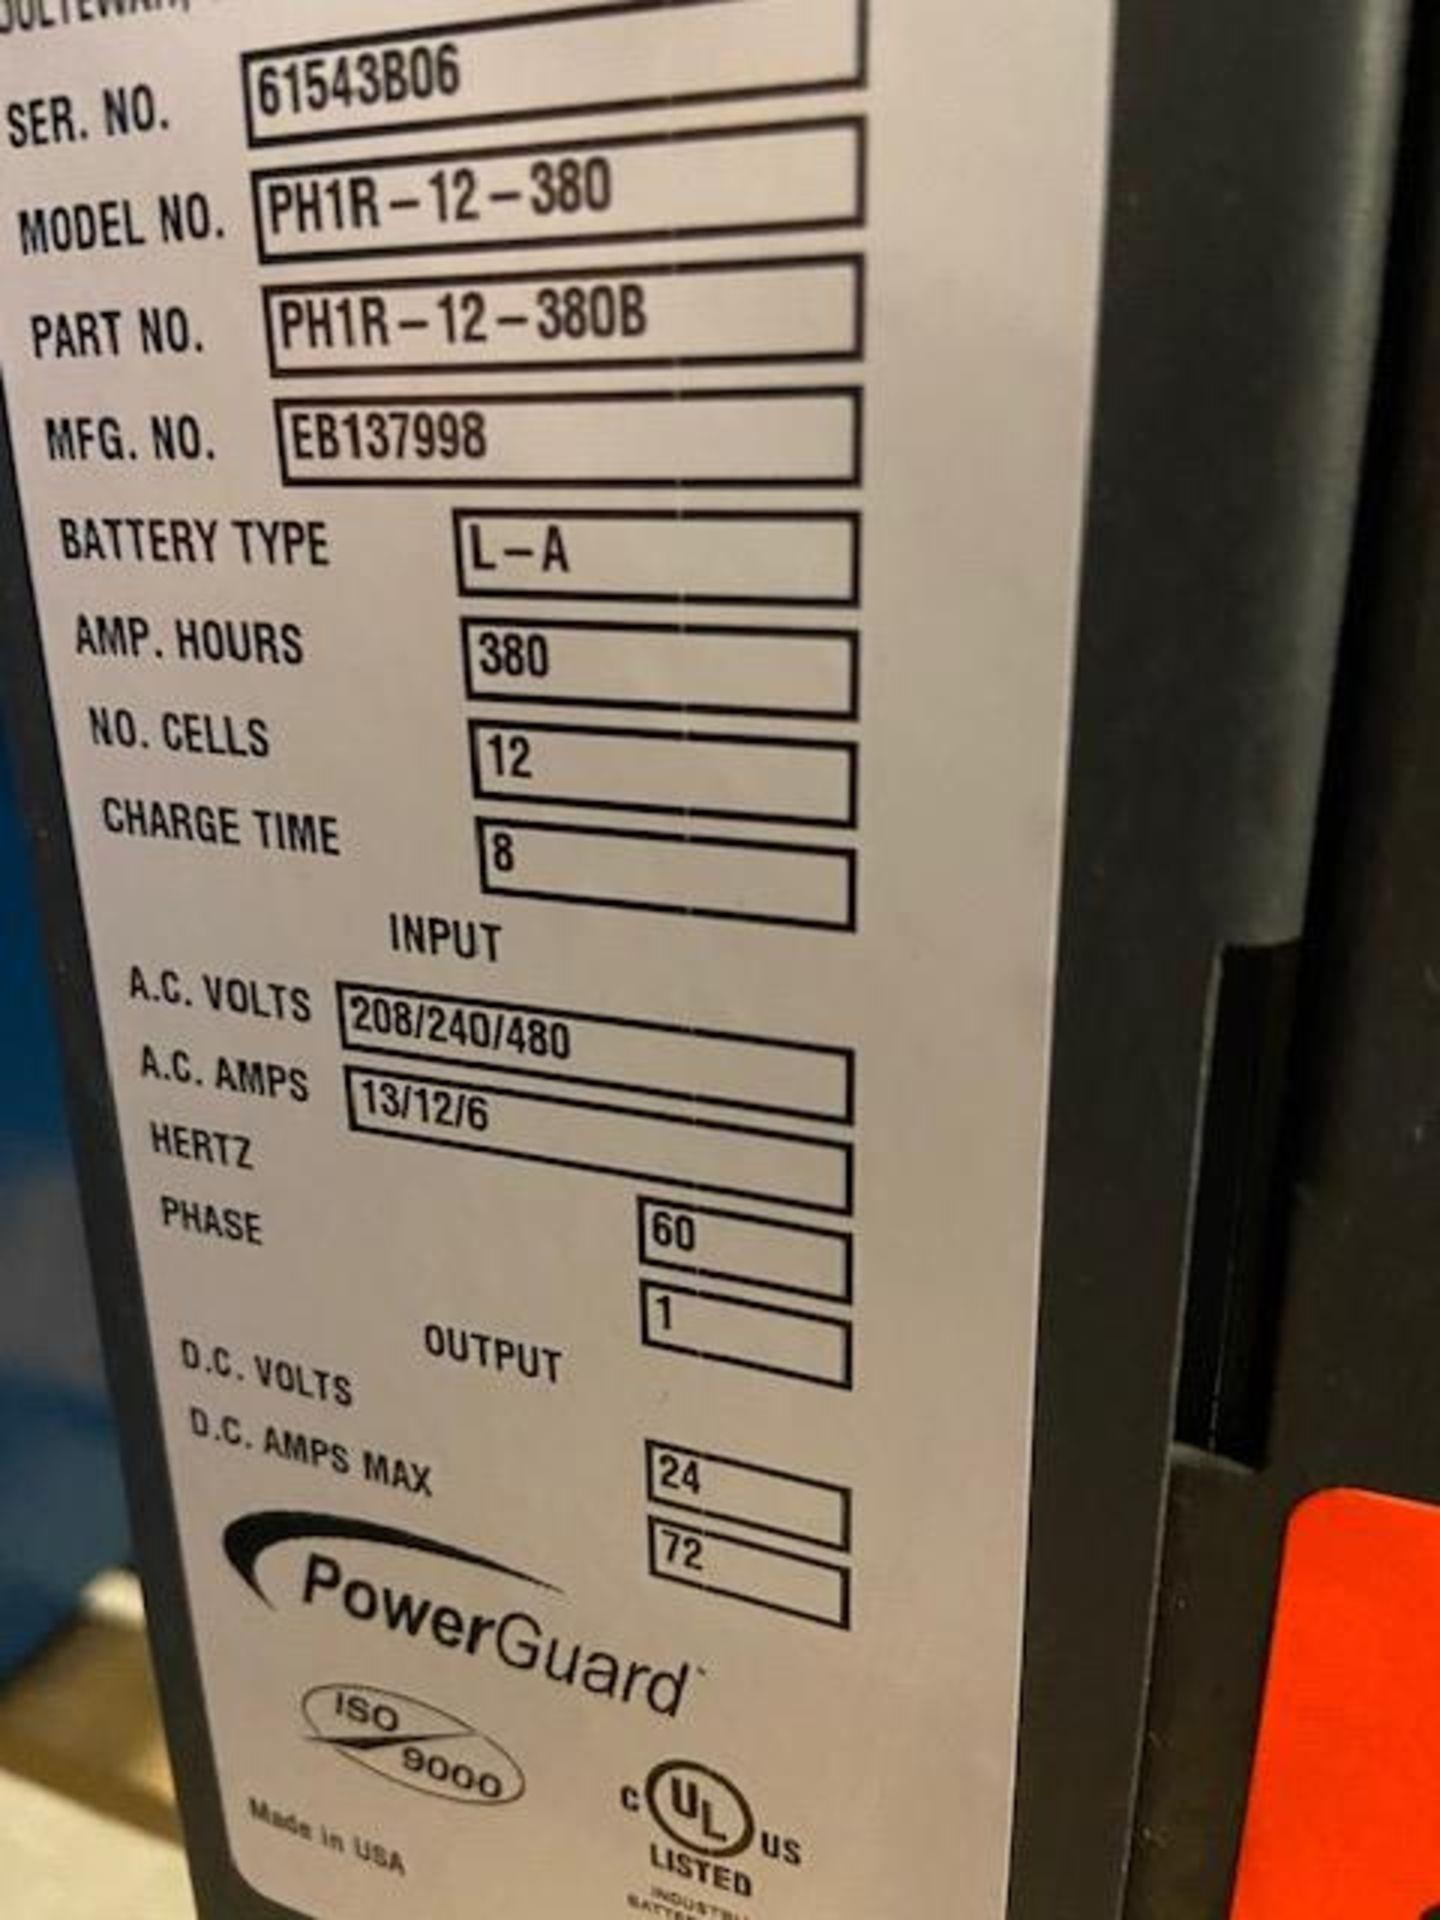 Hawker Pro PowerGuard HD Forklift Battery Charger 24V - 208/240/480V - Image 2 of 2